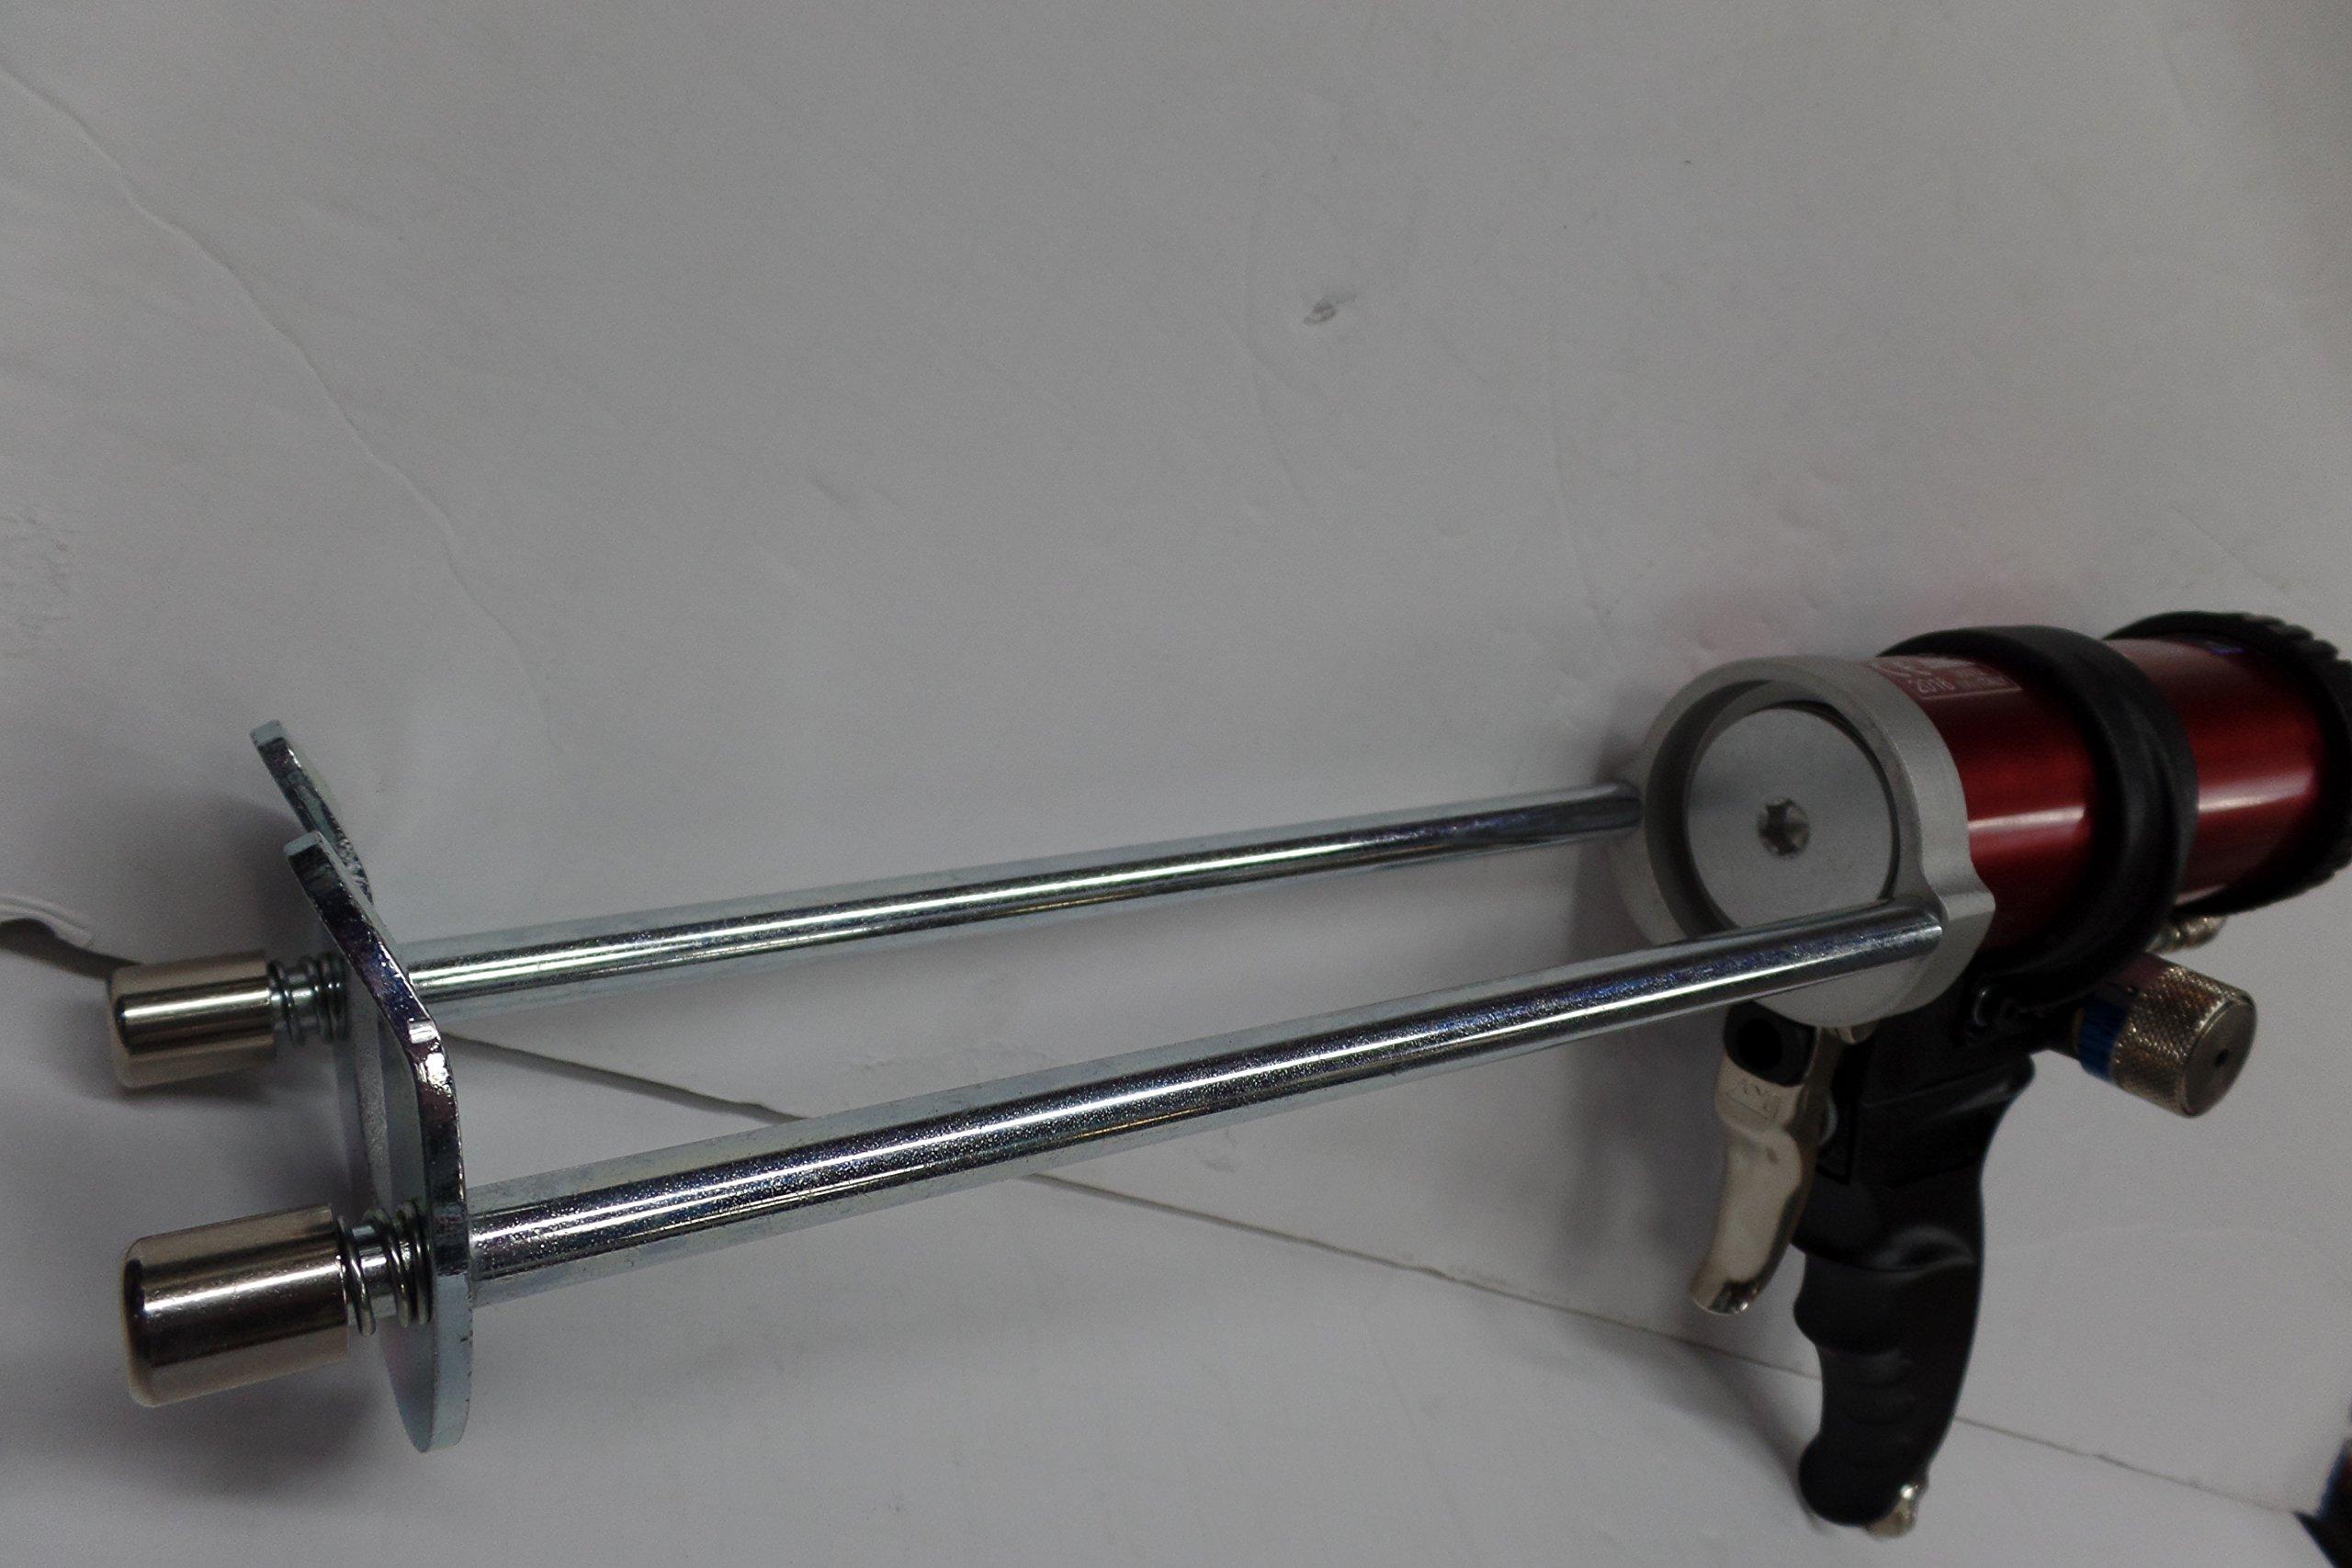 S31/2 caulking seam single component sealant gun by S31/2 (Image #3)